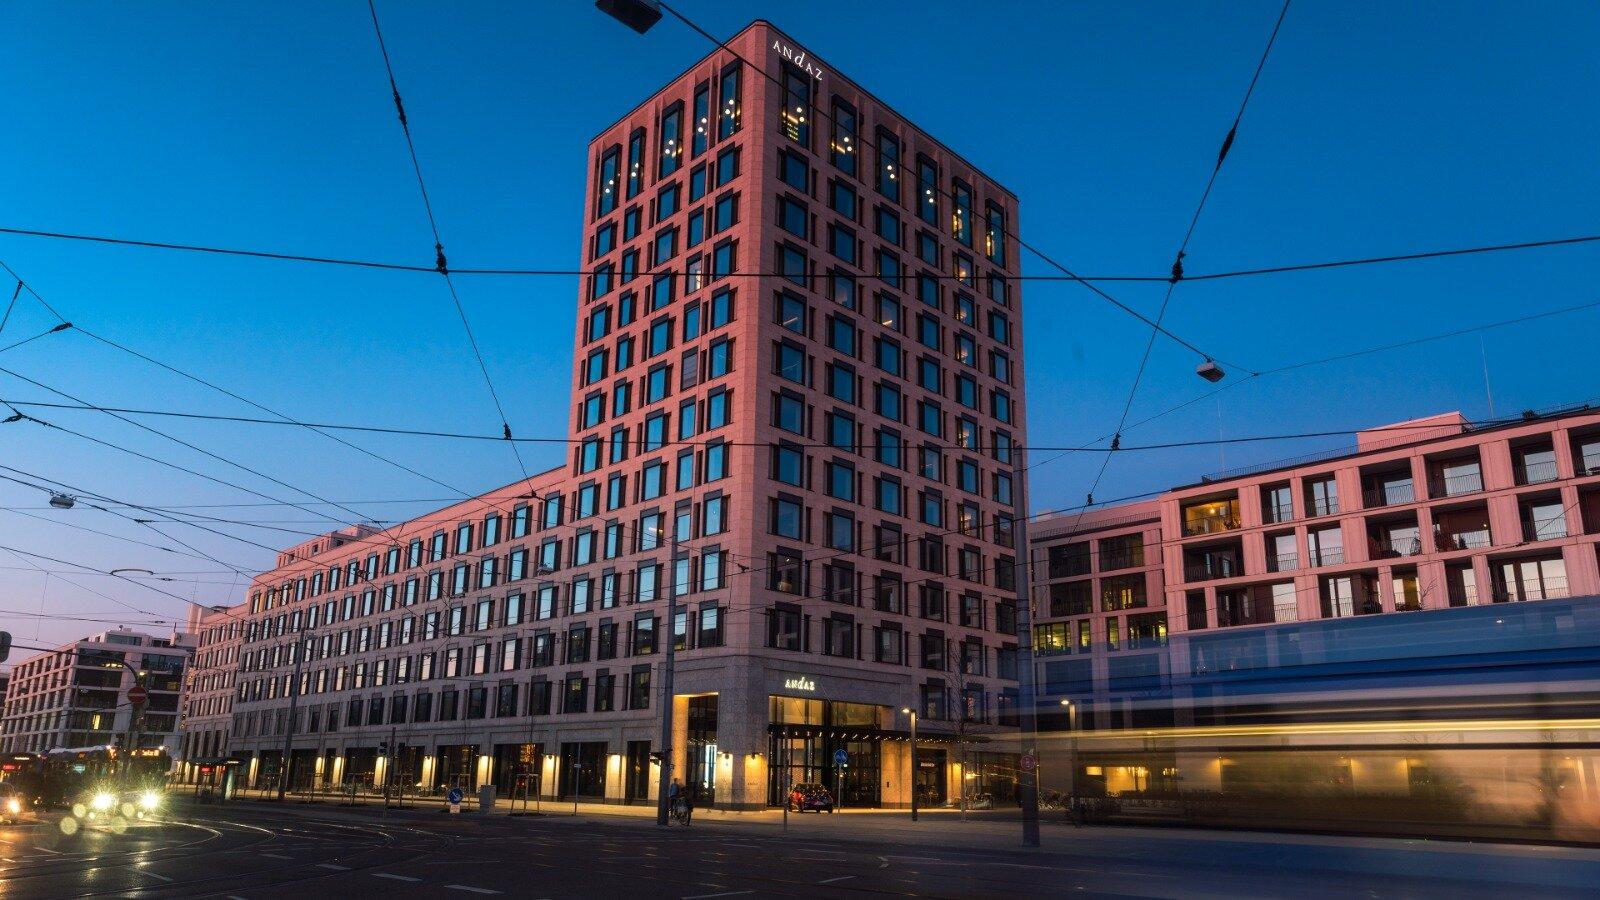 SKY – Andaz Hotel Munich